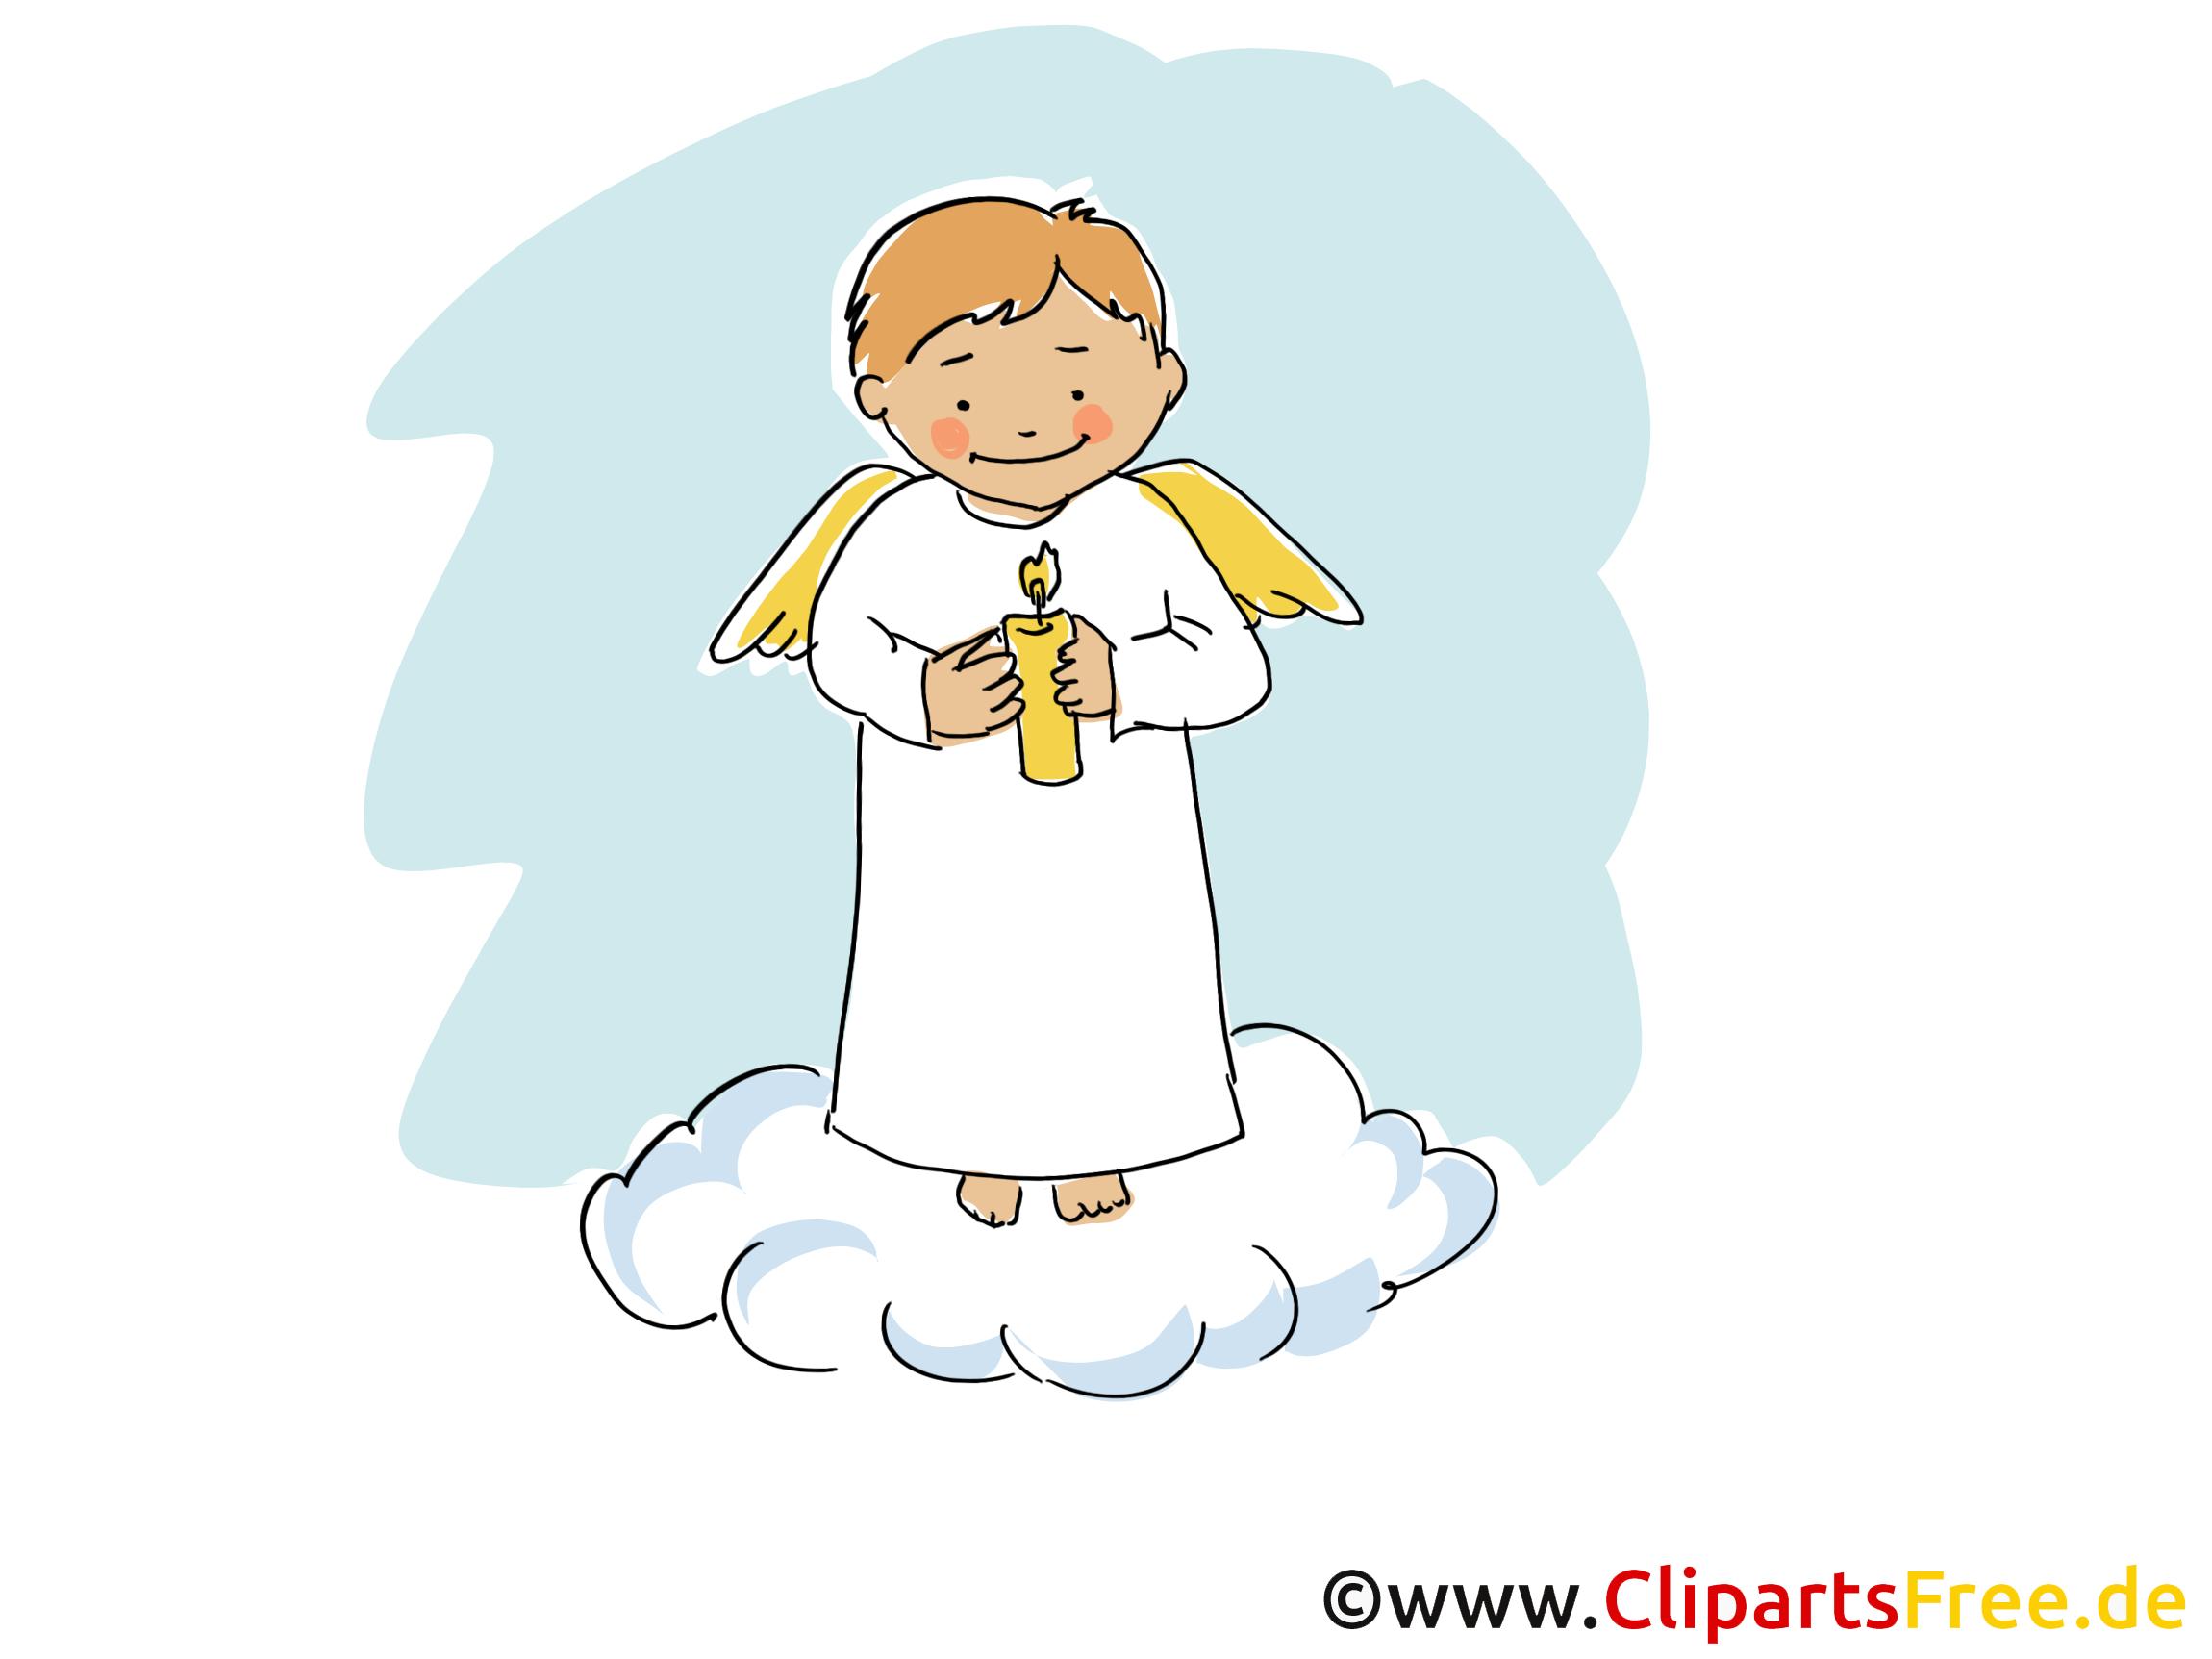 Einladung clipart png freeuse stock Einladung Taufe Karte, Clipart, Bild, Grafik, Cartoon ... png freeuse stock